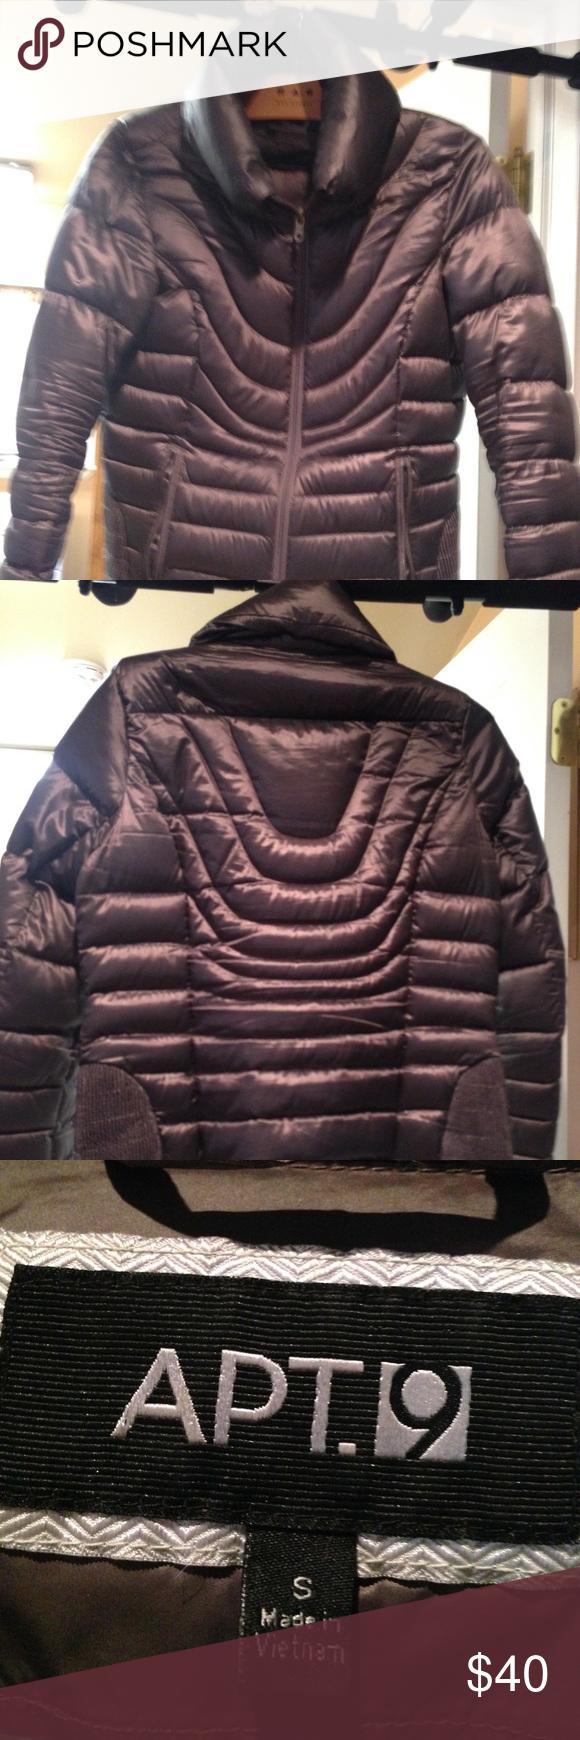 Apt 9 Kohl S Down Puffer Jacket Sporty Jacket Clothes Design Fashion [ 1740 x 580 Pixel ]